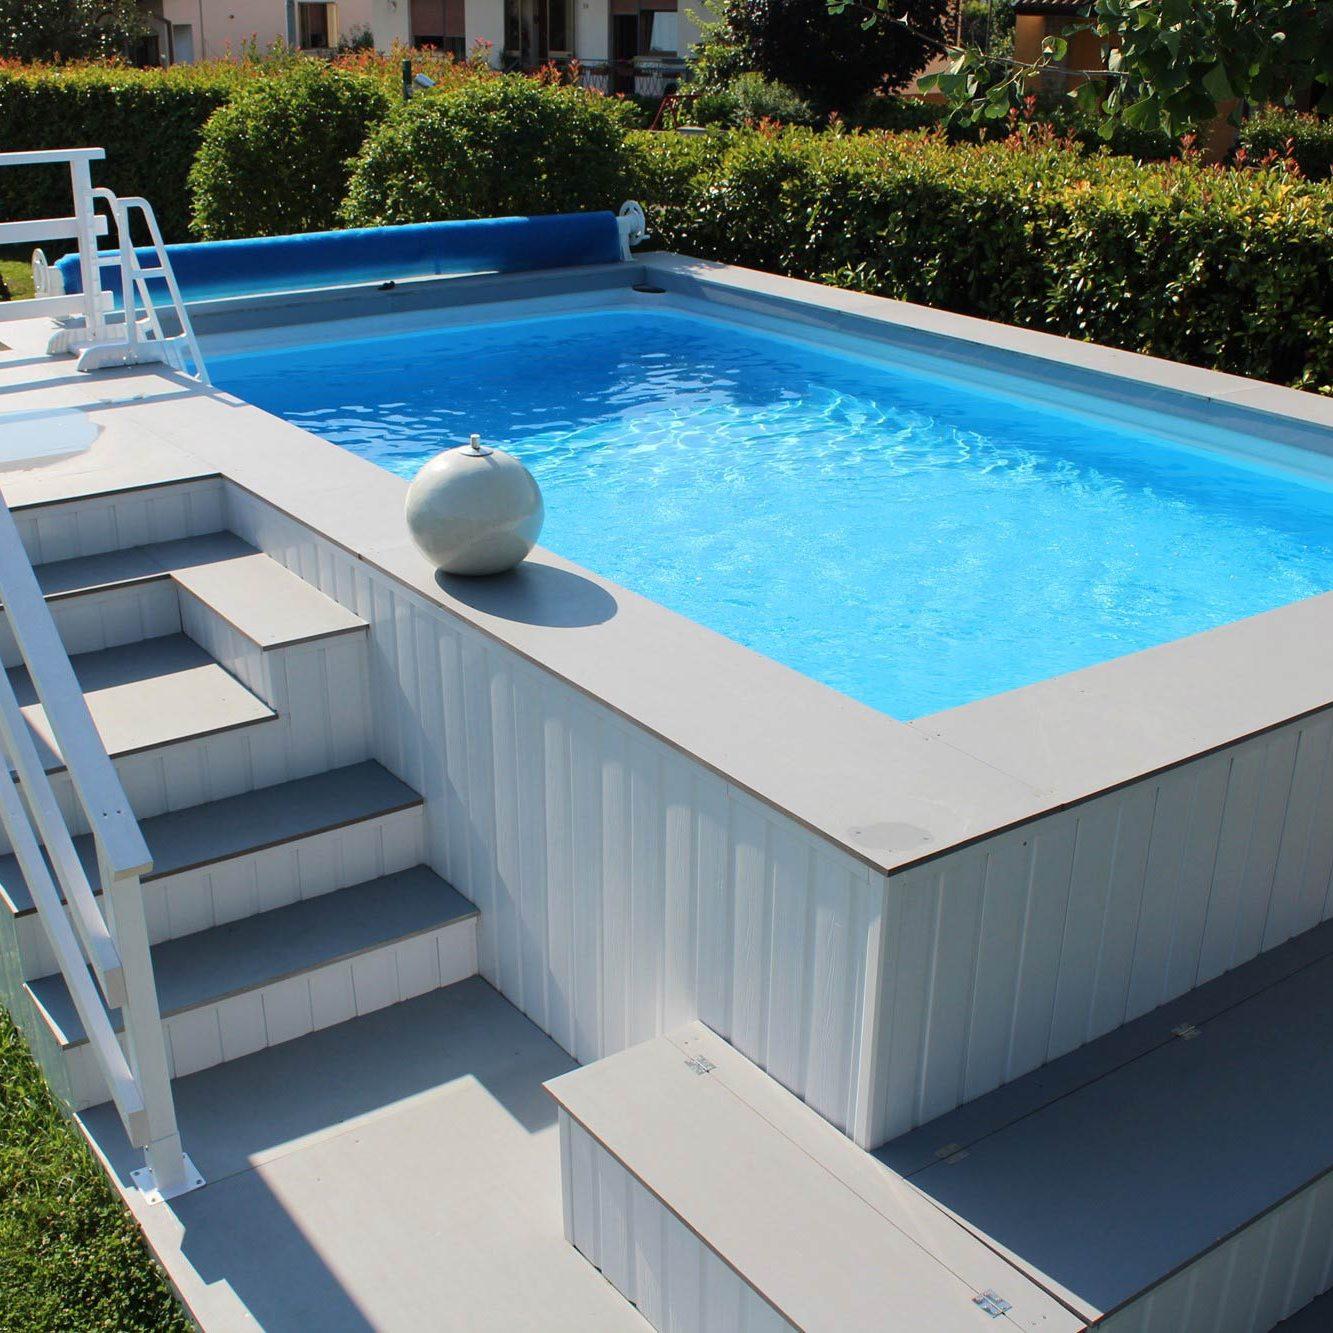 Piscine fuoriterra piscine da terrazzo e giardino - Aquazzura piscine ...